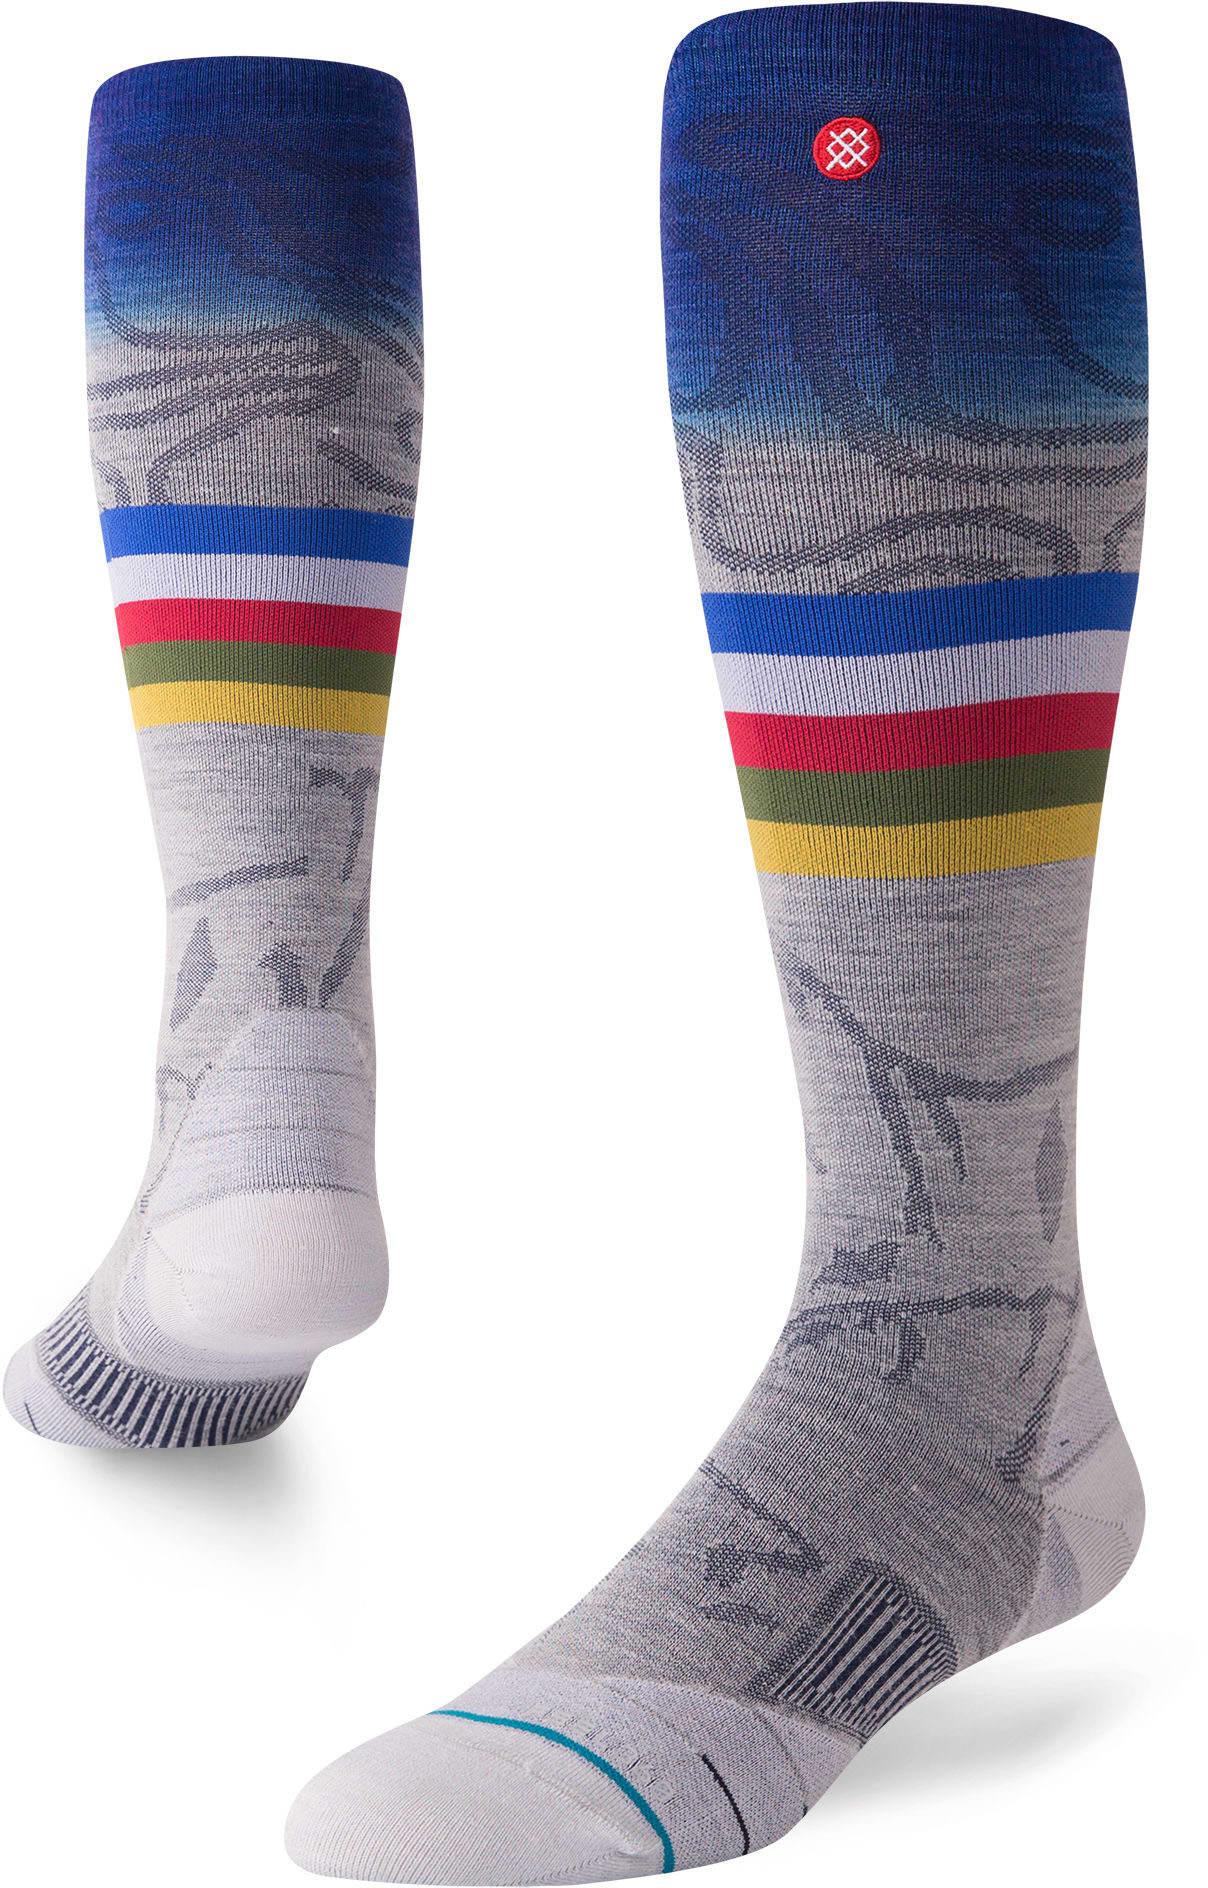 Stance Jc Socks 2019